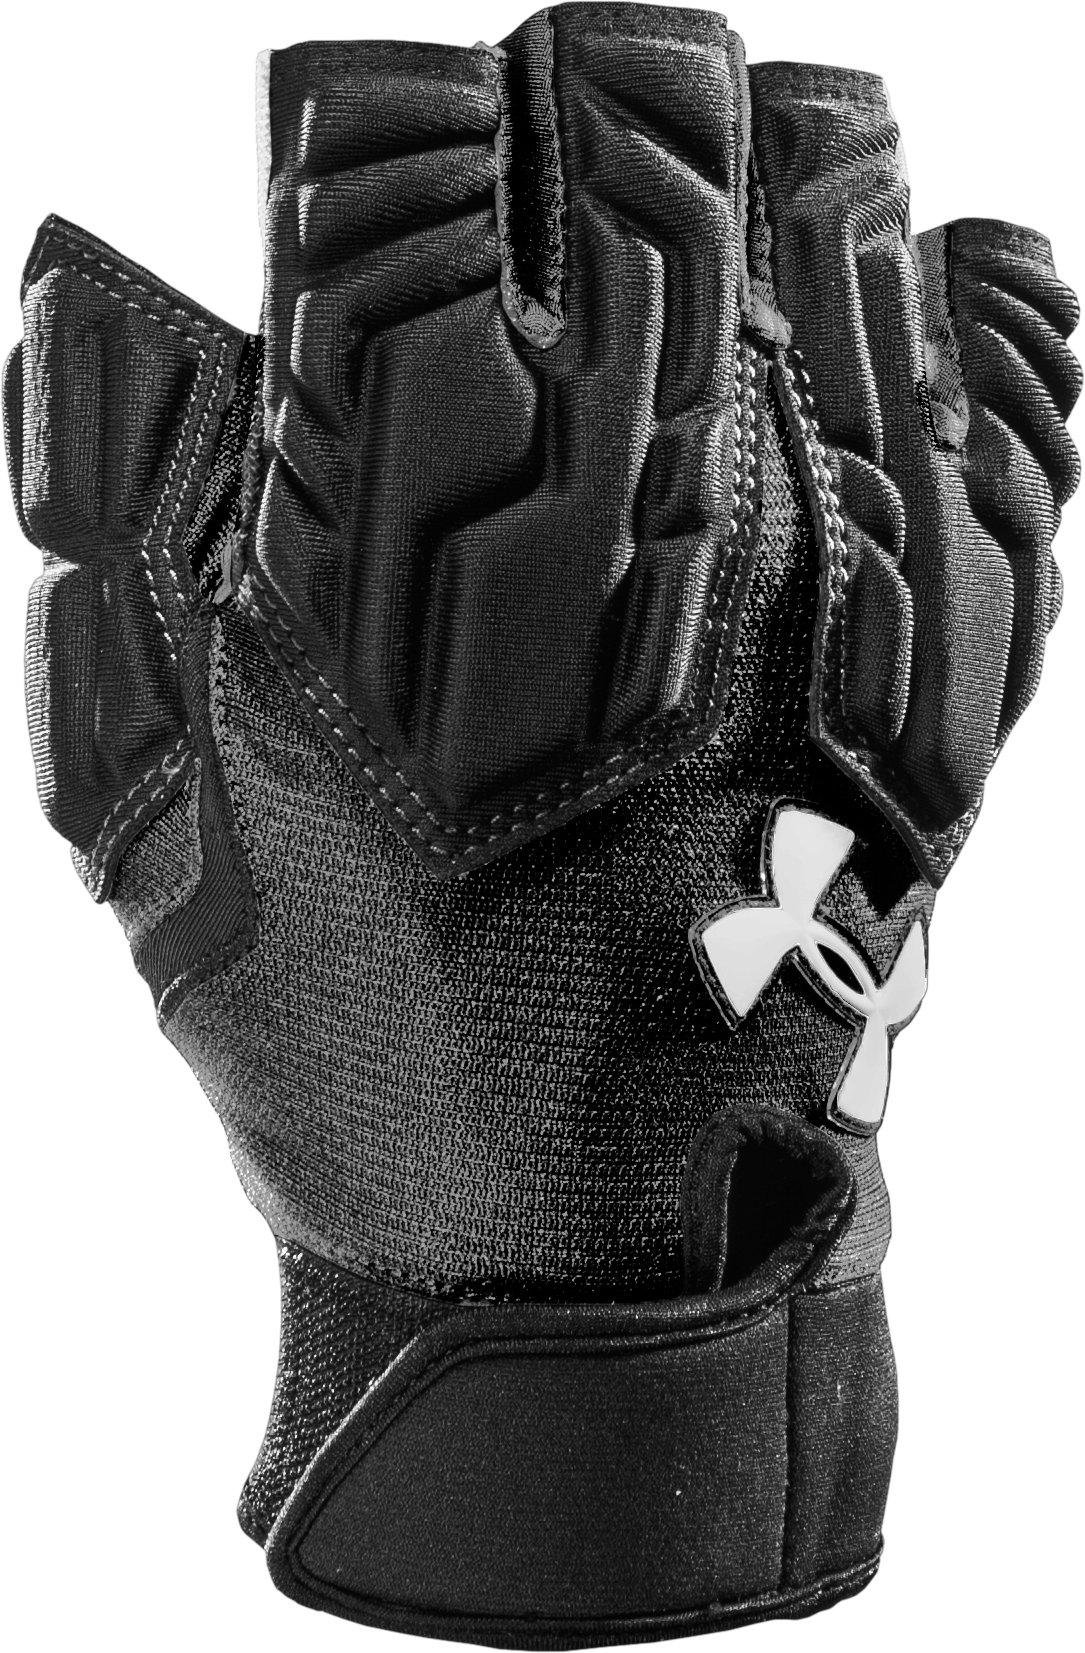 Under armour combat gloves